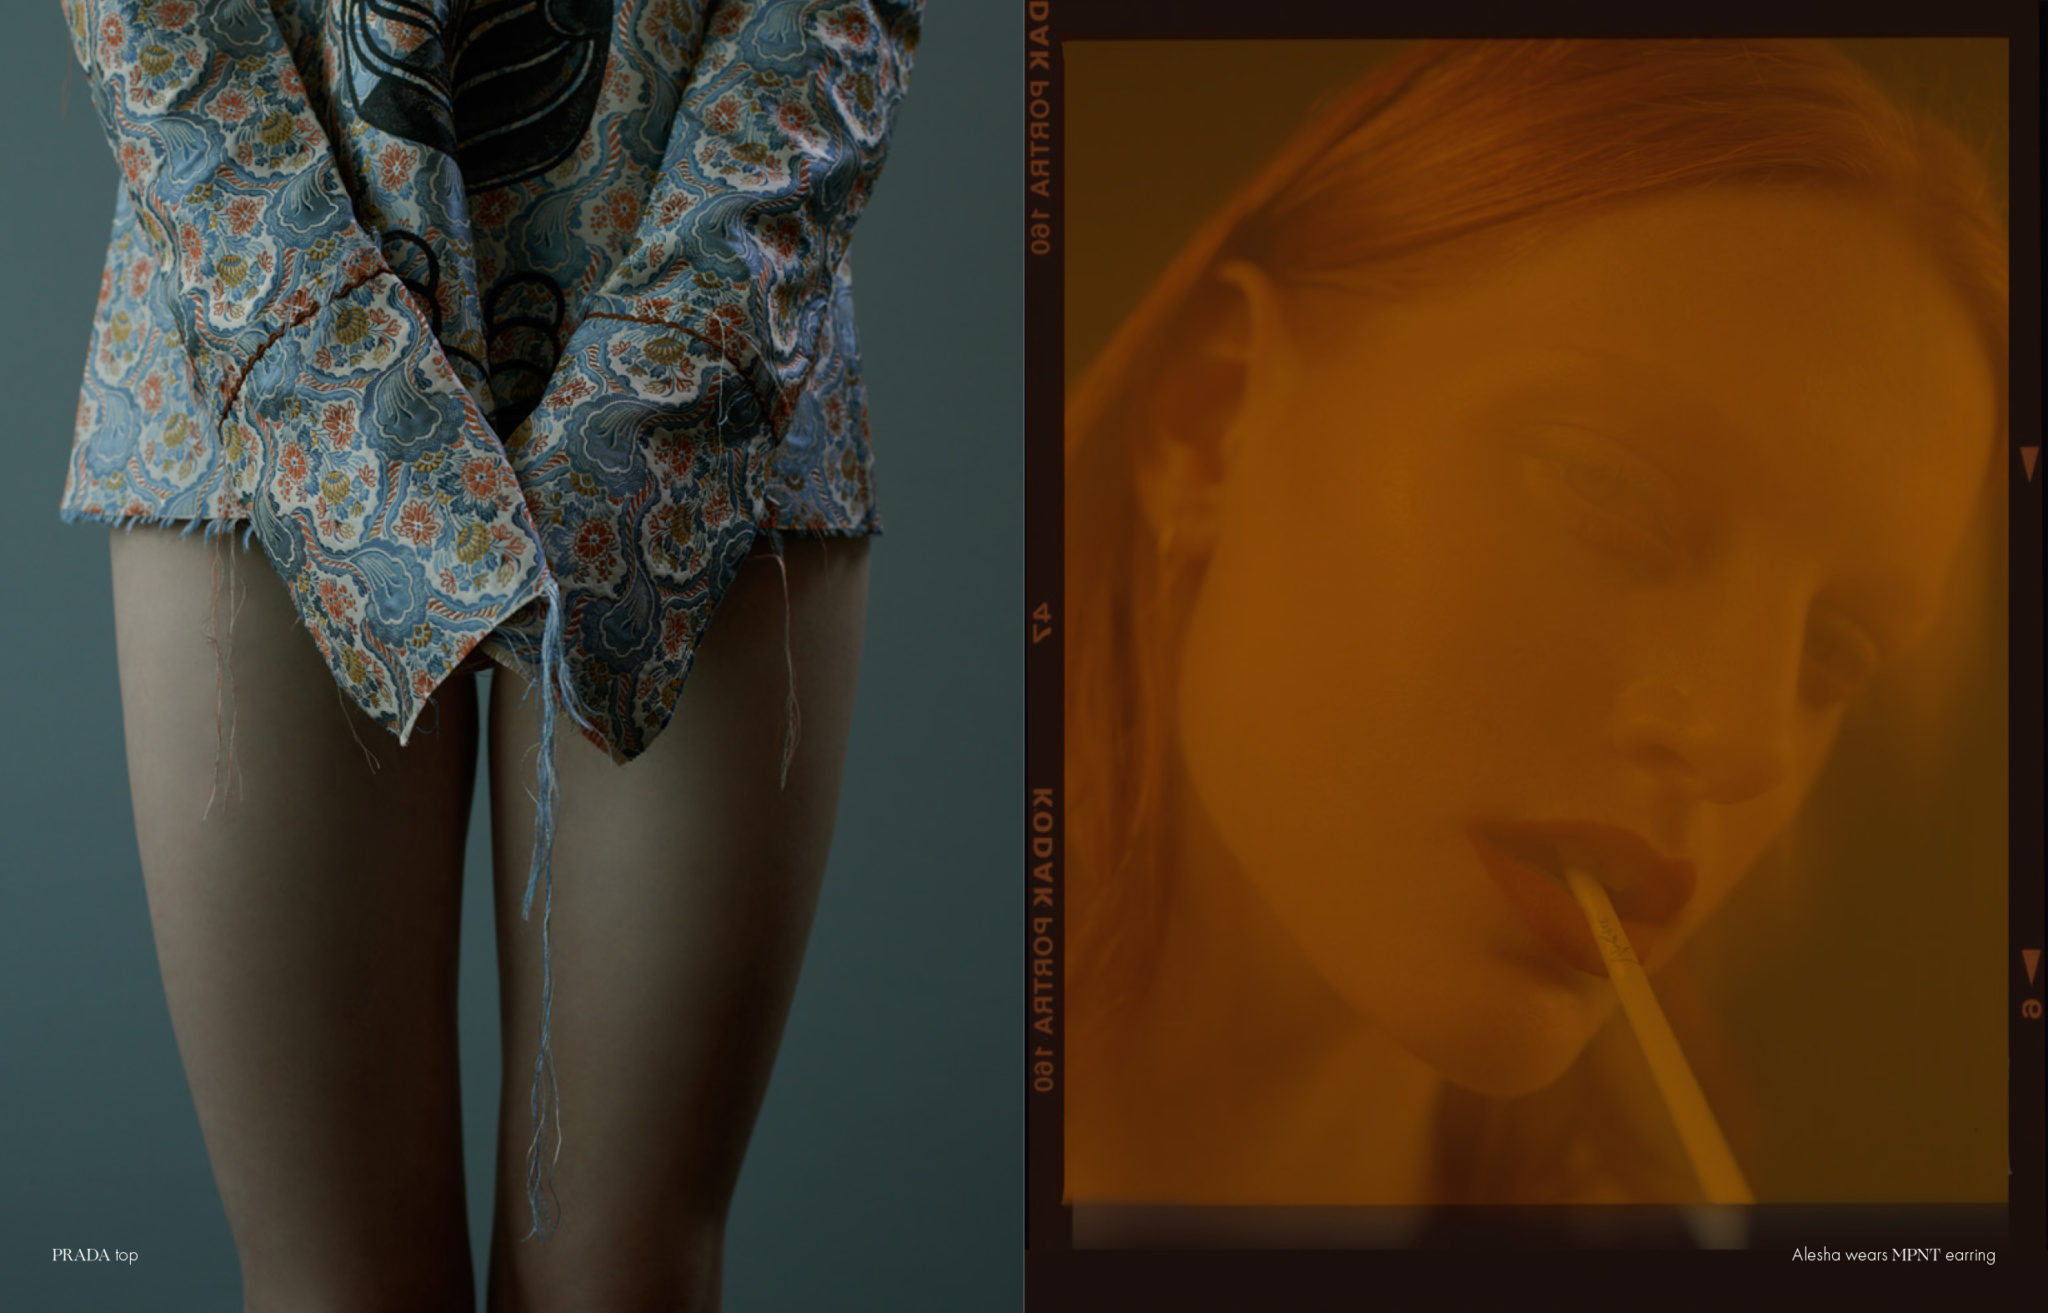 inprint-AleshaBria&Lily-5